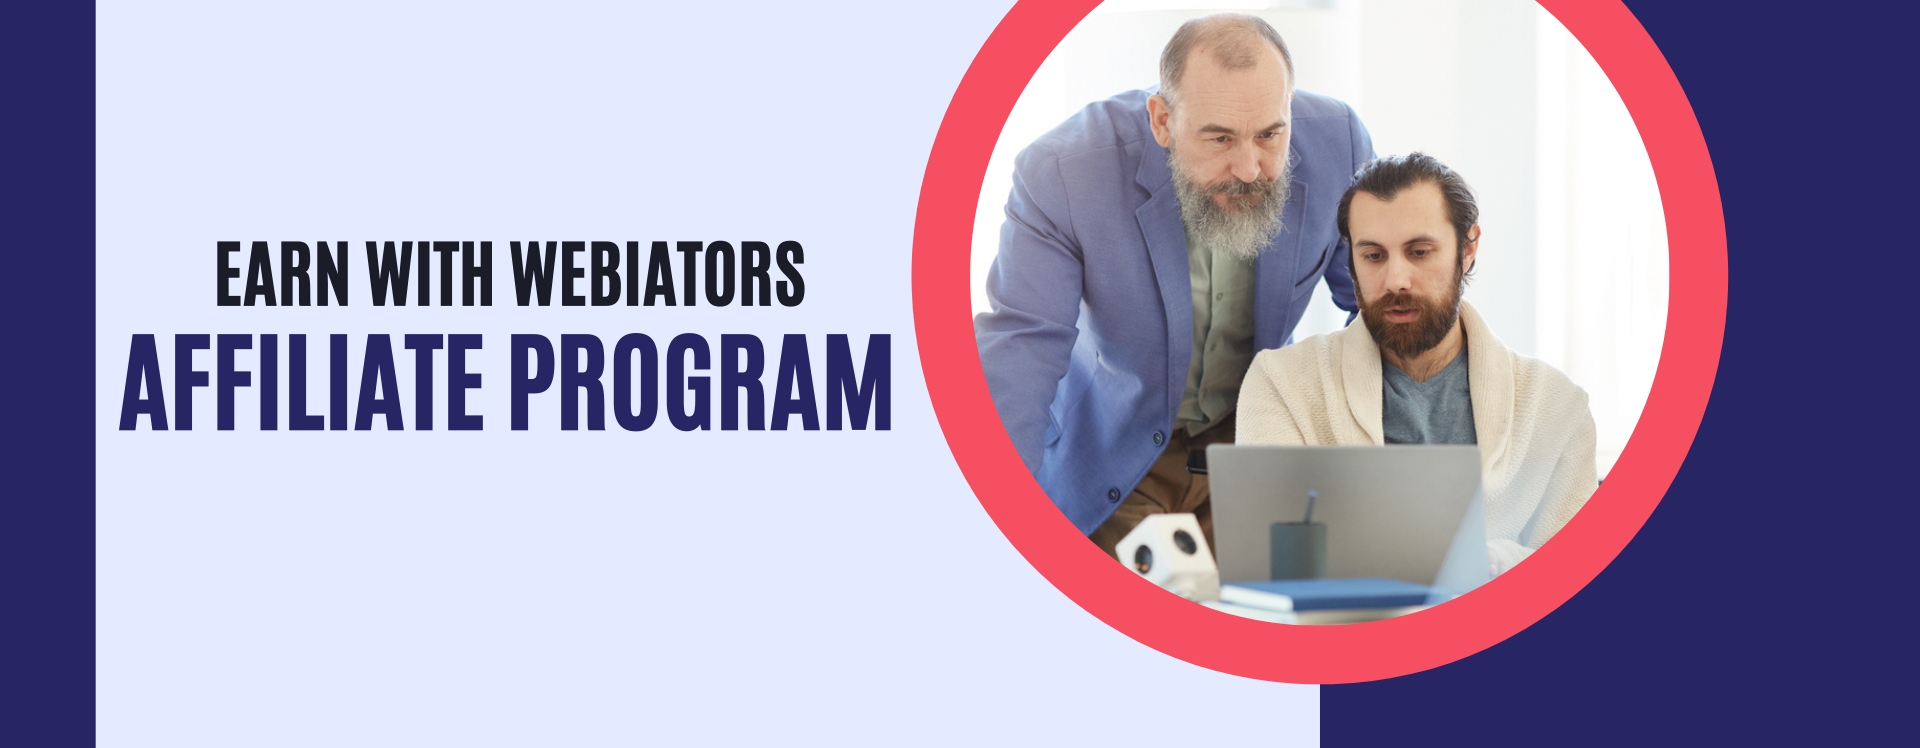 Webiators-affiliate-program